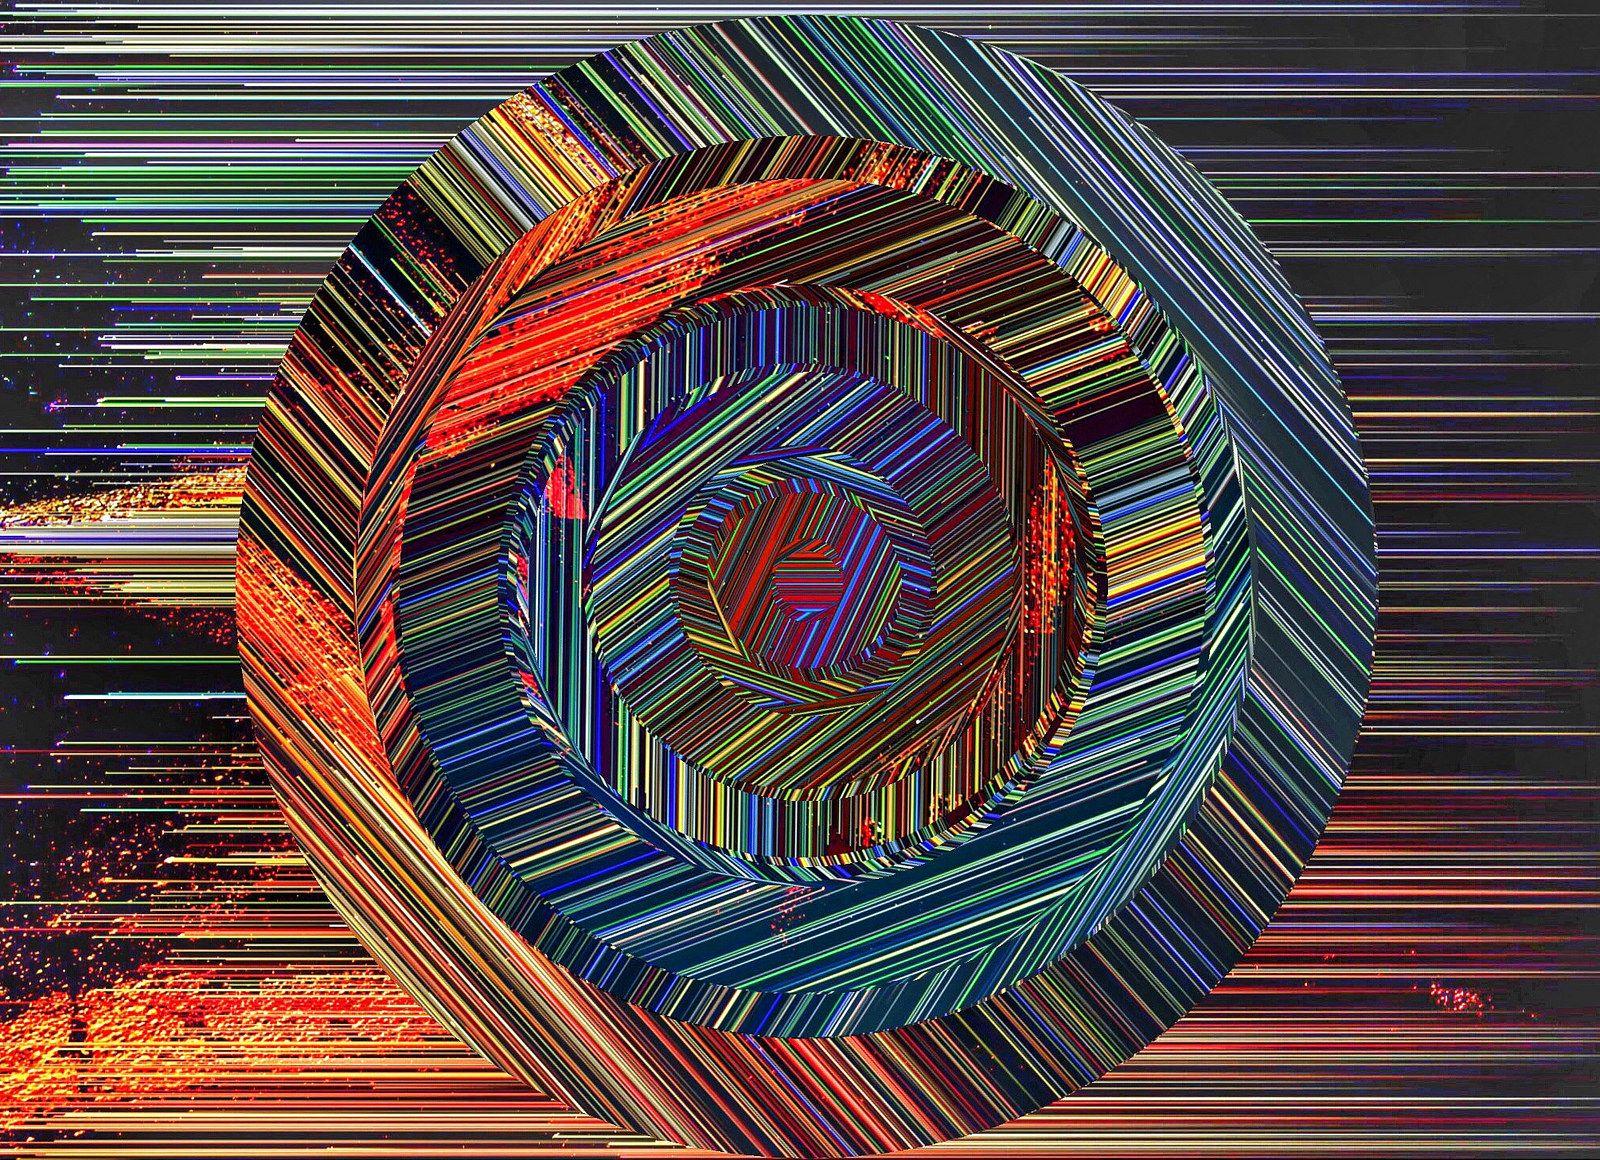 Circled, Anne Hennessey, glitch and digital manipulation.